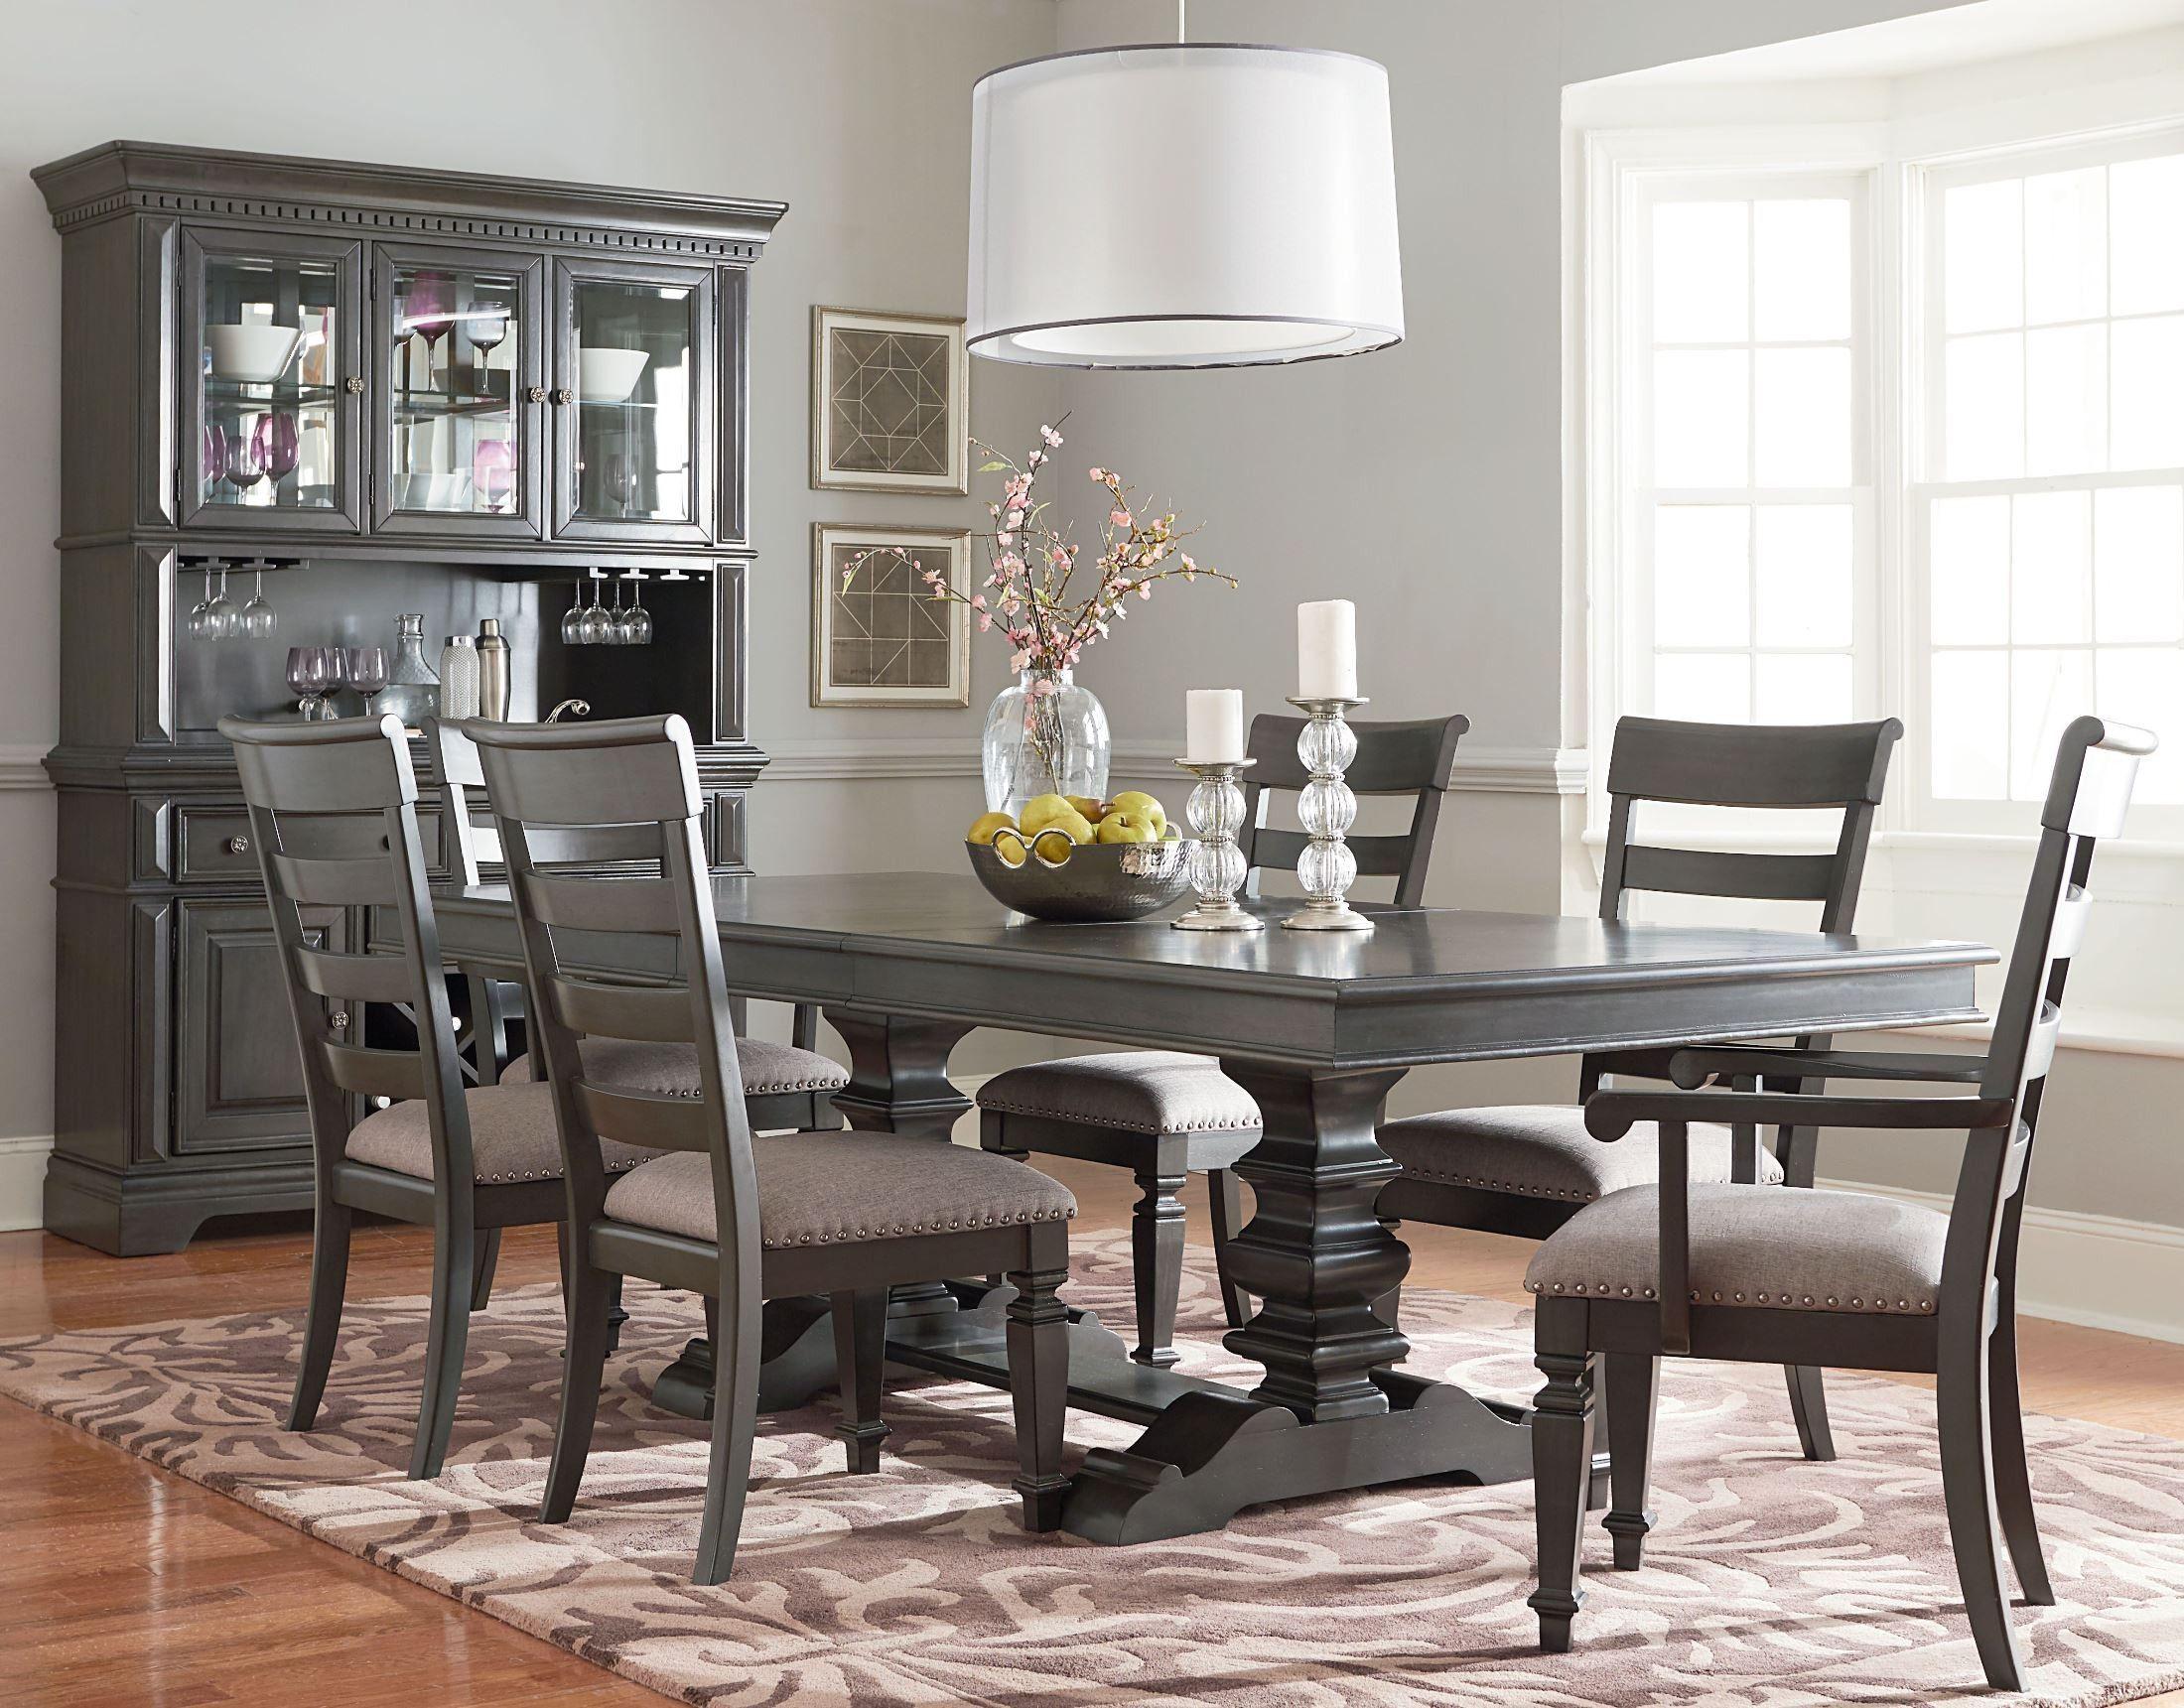 Garrison Burnished Grey Extendable Trestle Dining Table Dining Room Table Dining Room Sets White Dining Room